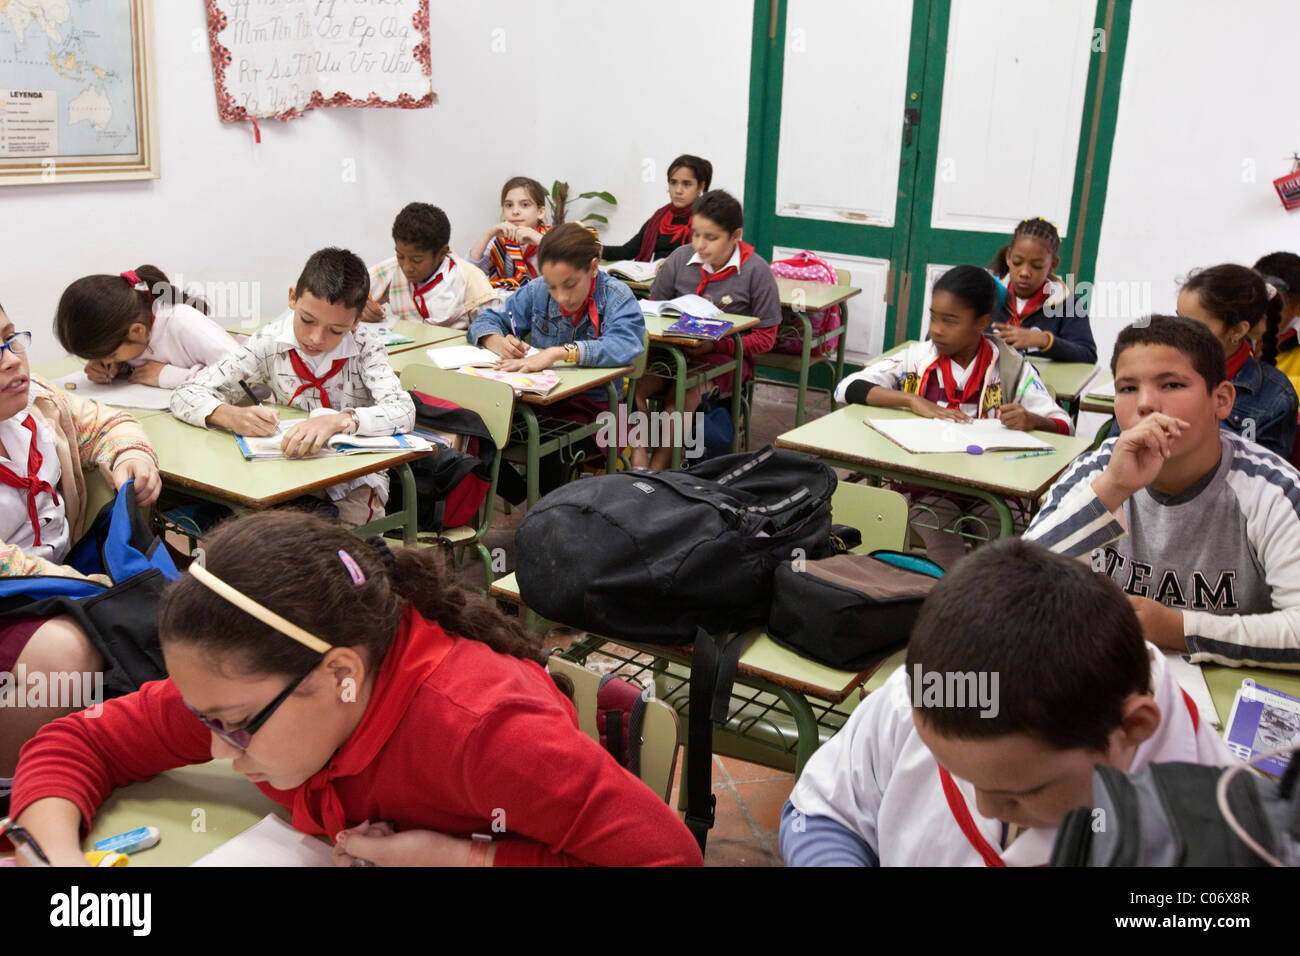 Cuba, Havana. Sixth Grade Students in Class Studying Cuban History. - Stock Image